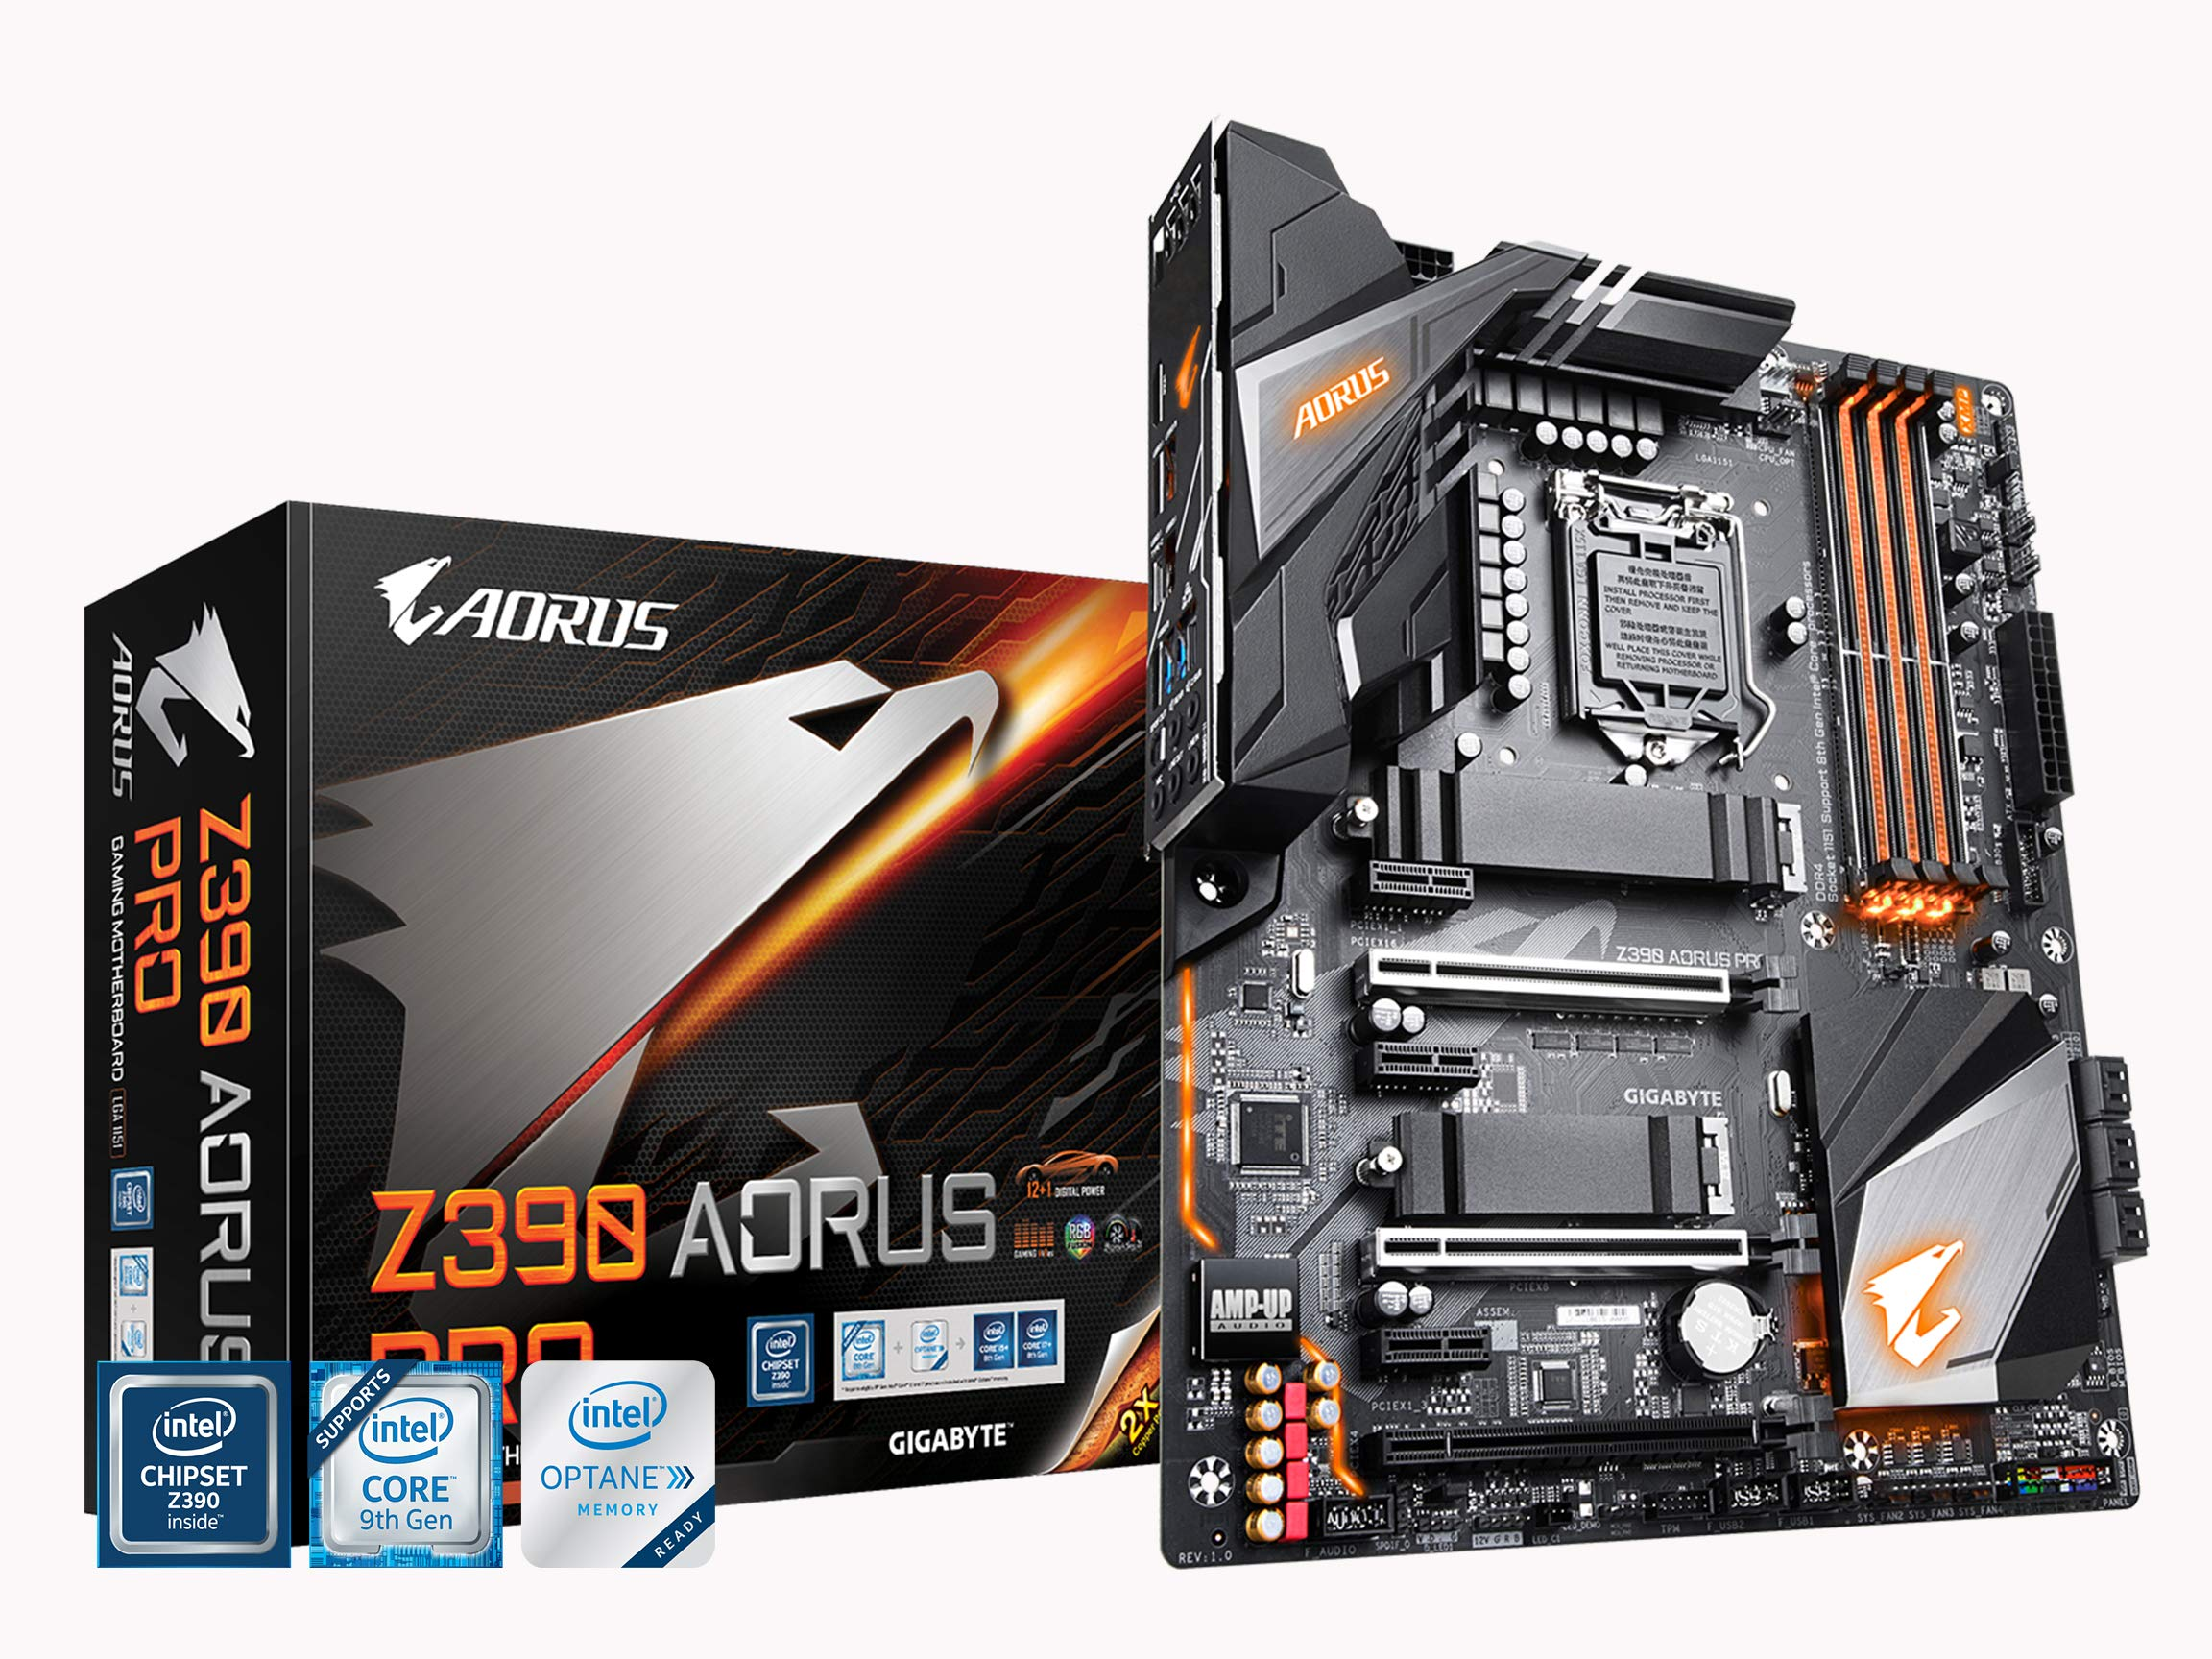 Gigabyte Z390 AORUS PRO (Intel LGA1151/Z390/ATX/2xM.2 Thermal Guard/Realtek ALC1220/RGB Fusion/Gaming Motherboard) by Gigabyte